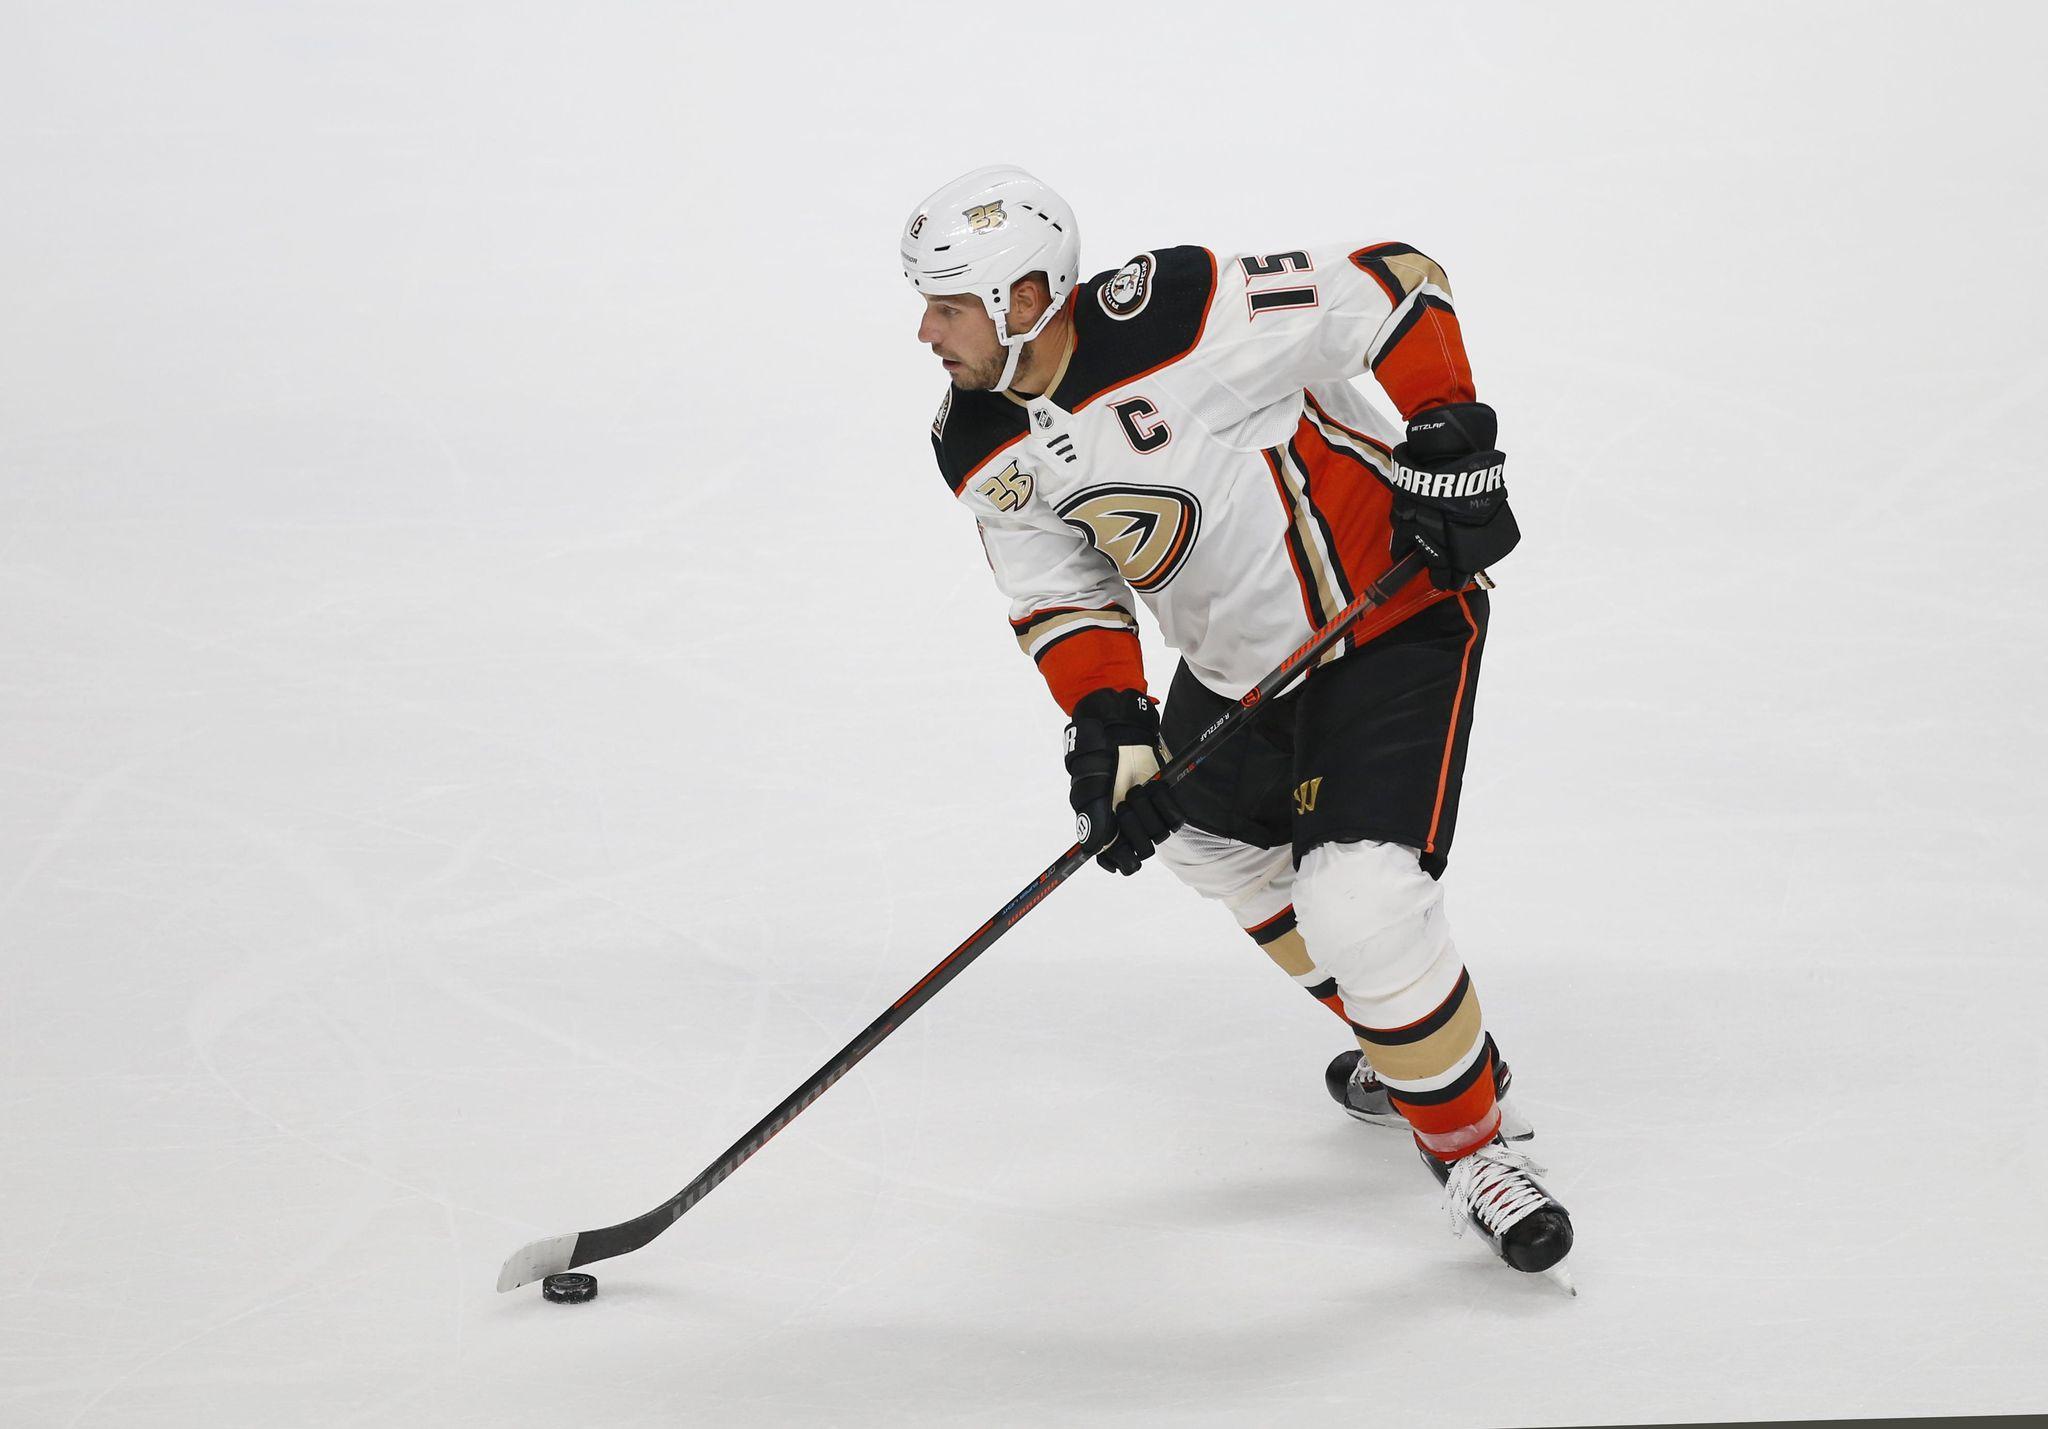 Ducks_preview_hockey_07844_s2048x1429